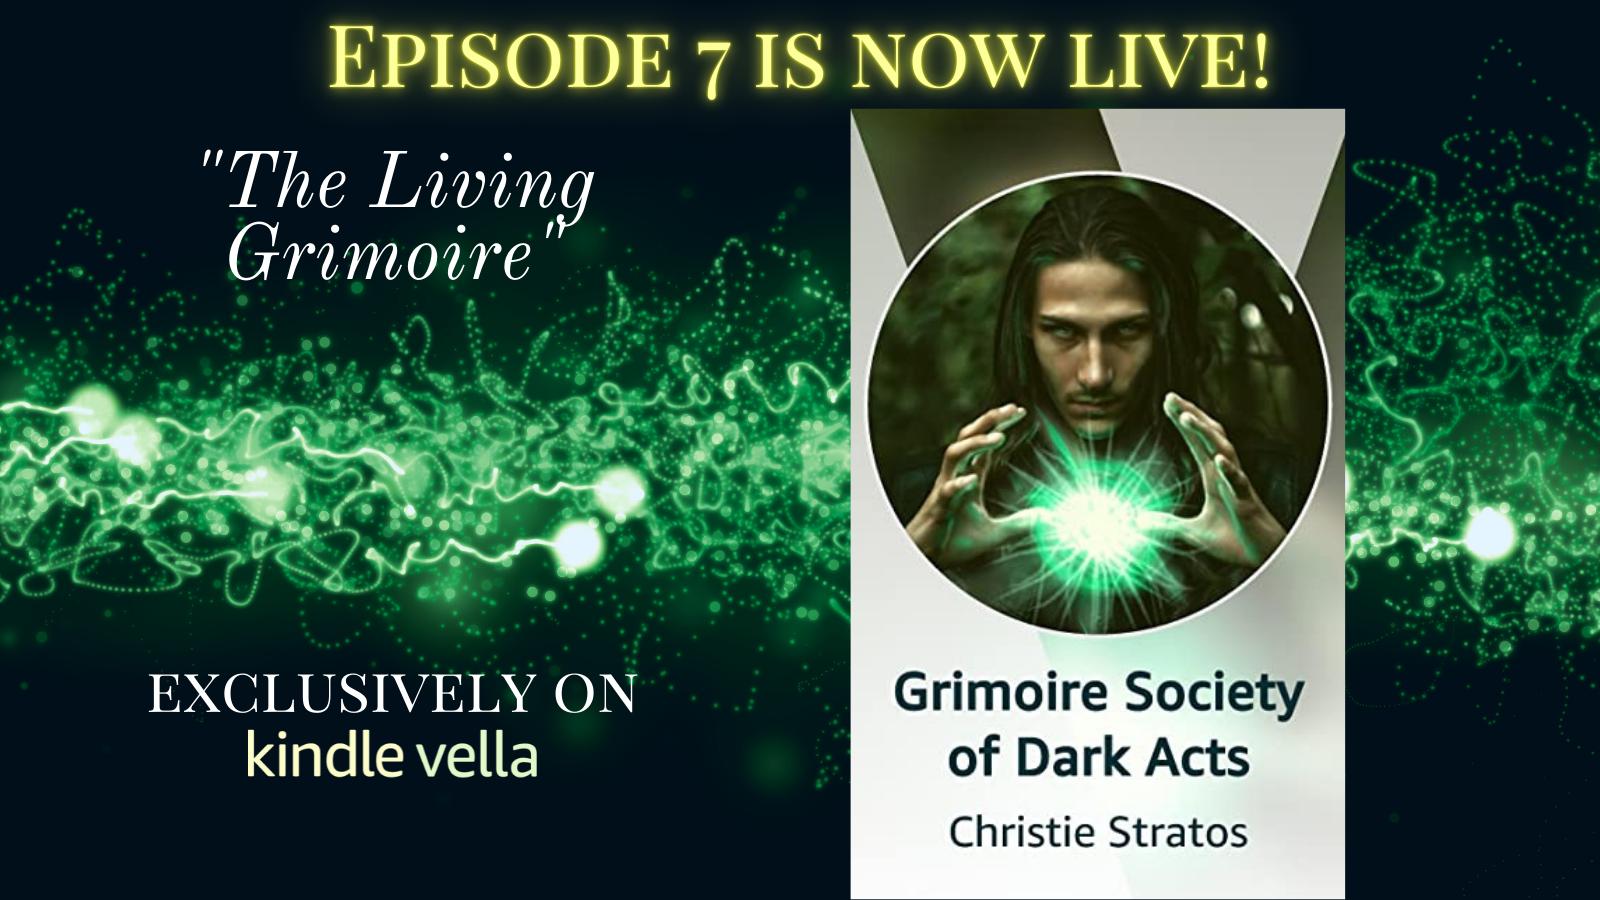 Grimoire Society of Dark Acts Episode 7